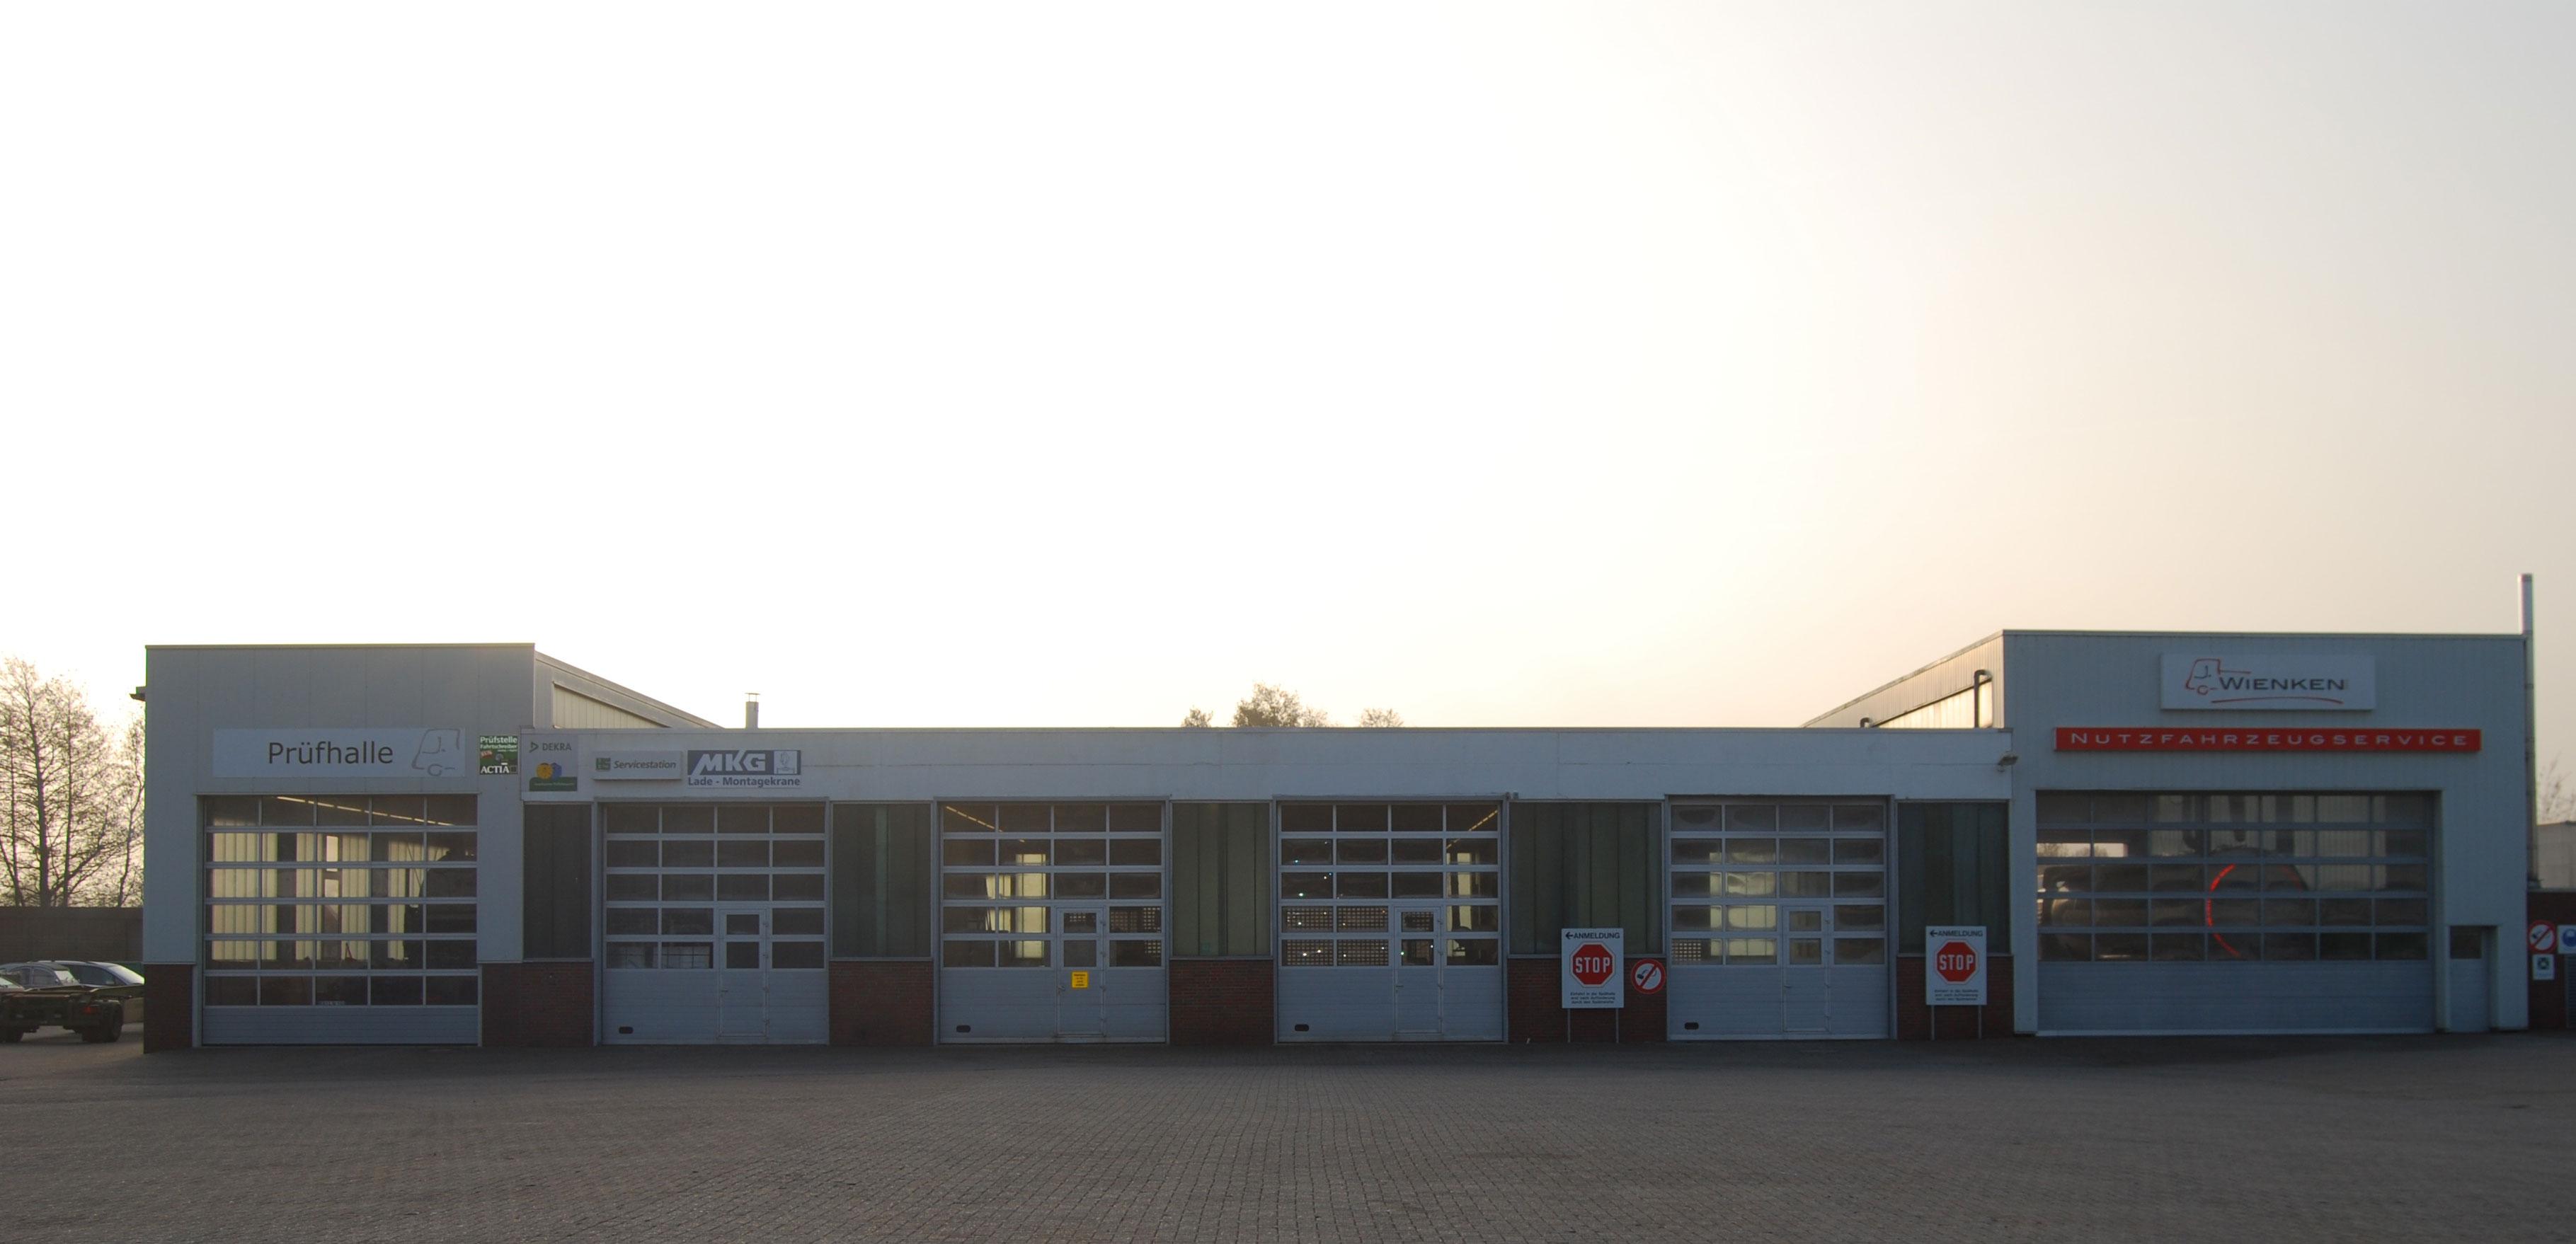 Wienken Nutzfahrzeugservice in Varel